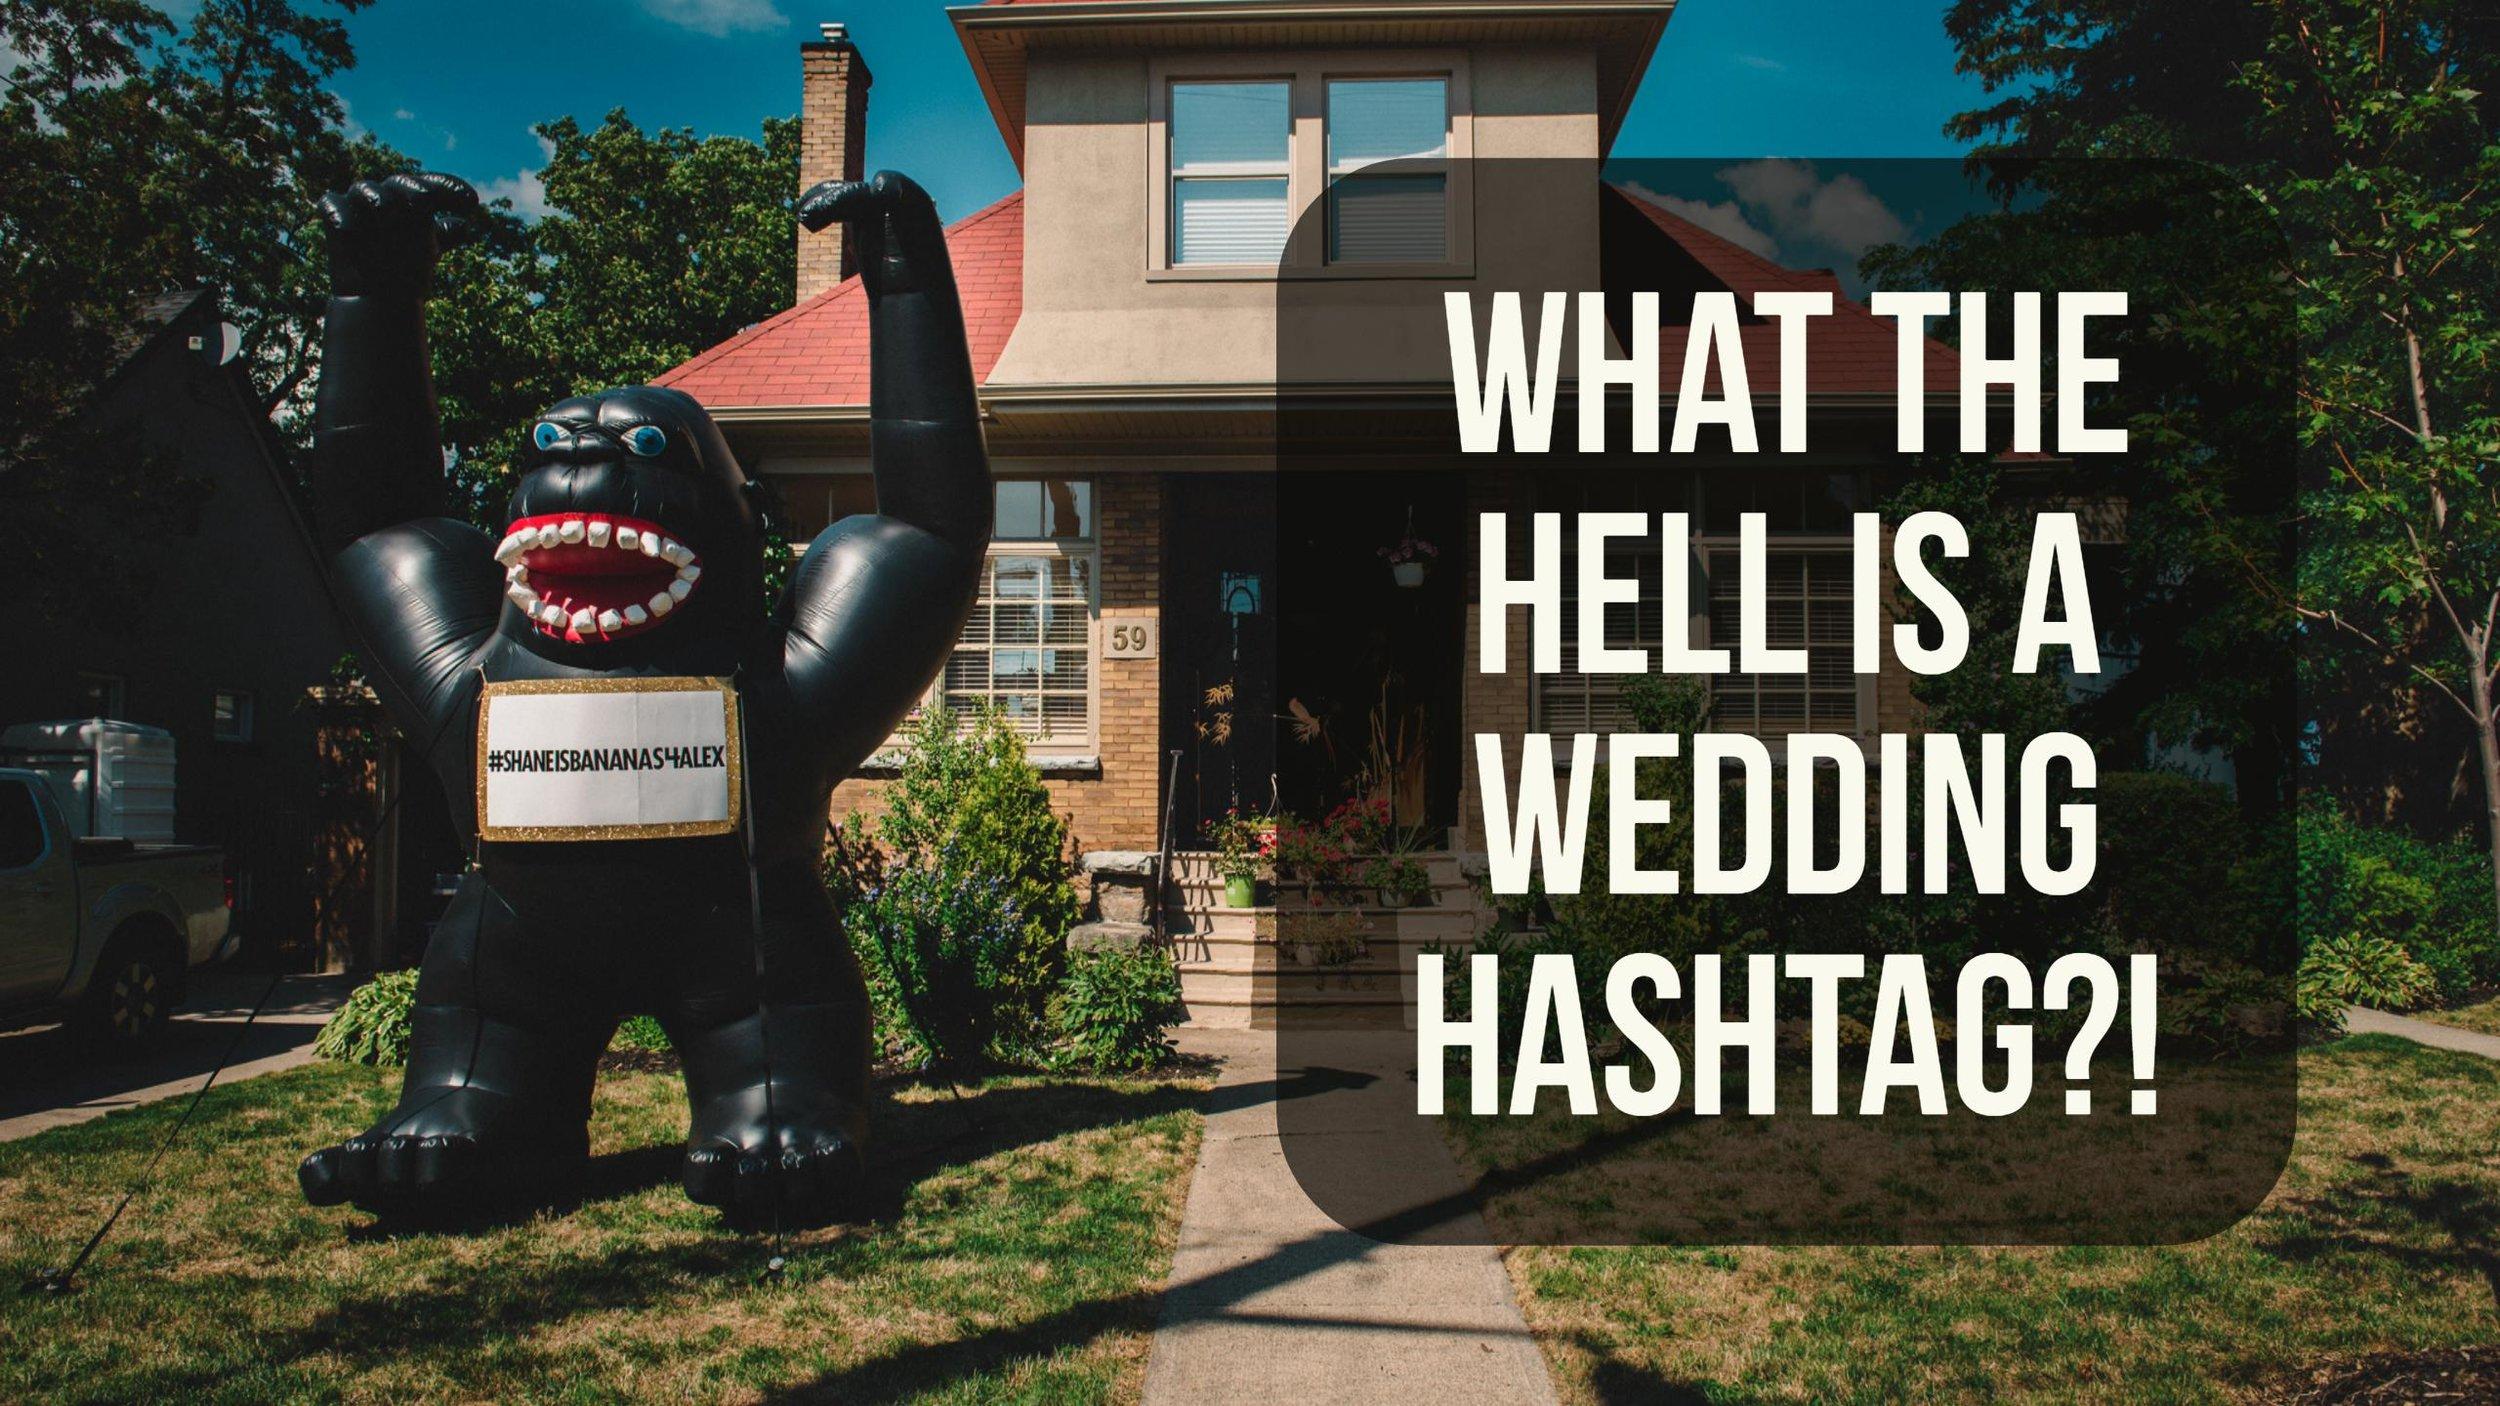 Mocha Tree Studios Ottawa Wedding and Engagement Photographer and Videographer Dark Moody Intimate Authentic Modern Romantic Cinematic Best Candid Wedding Hashtag